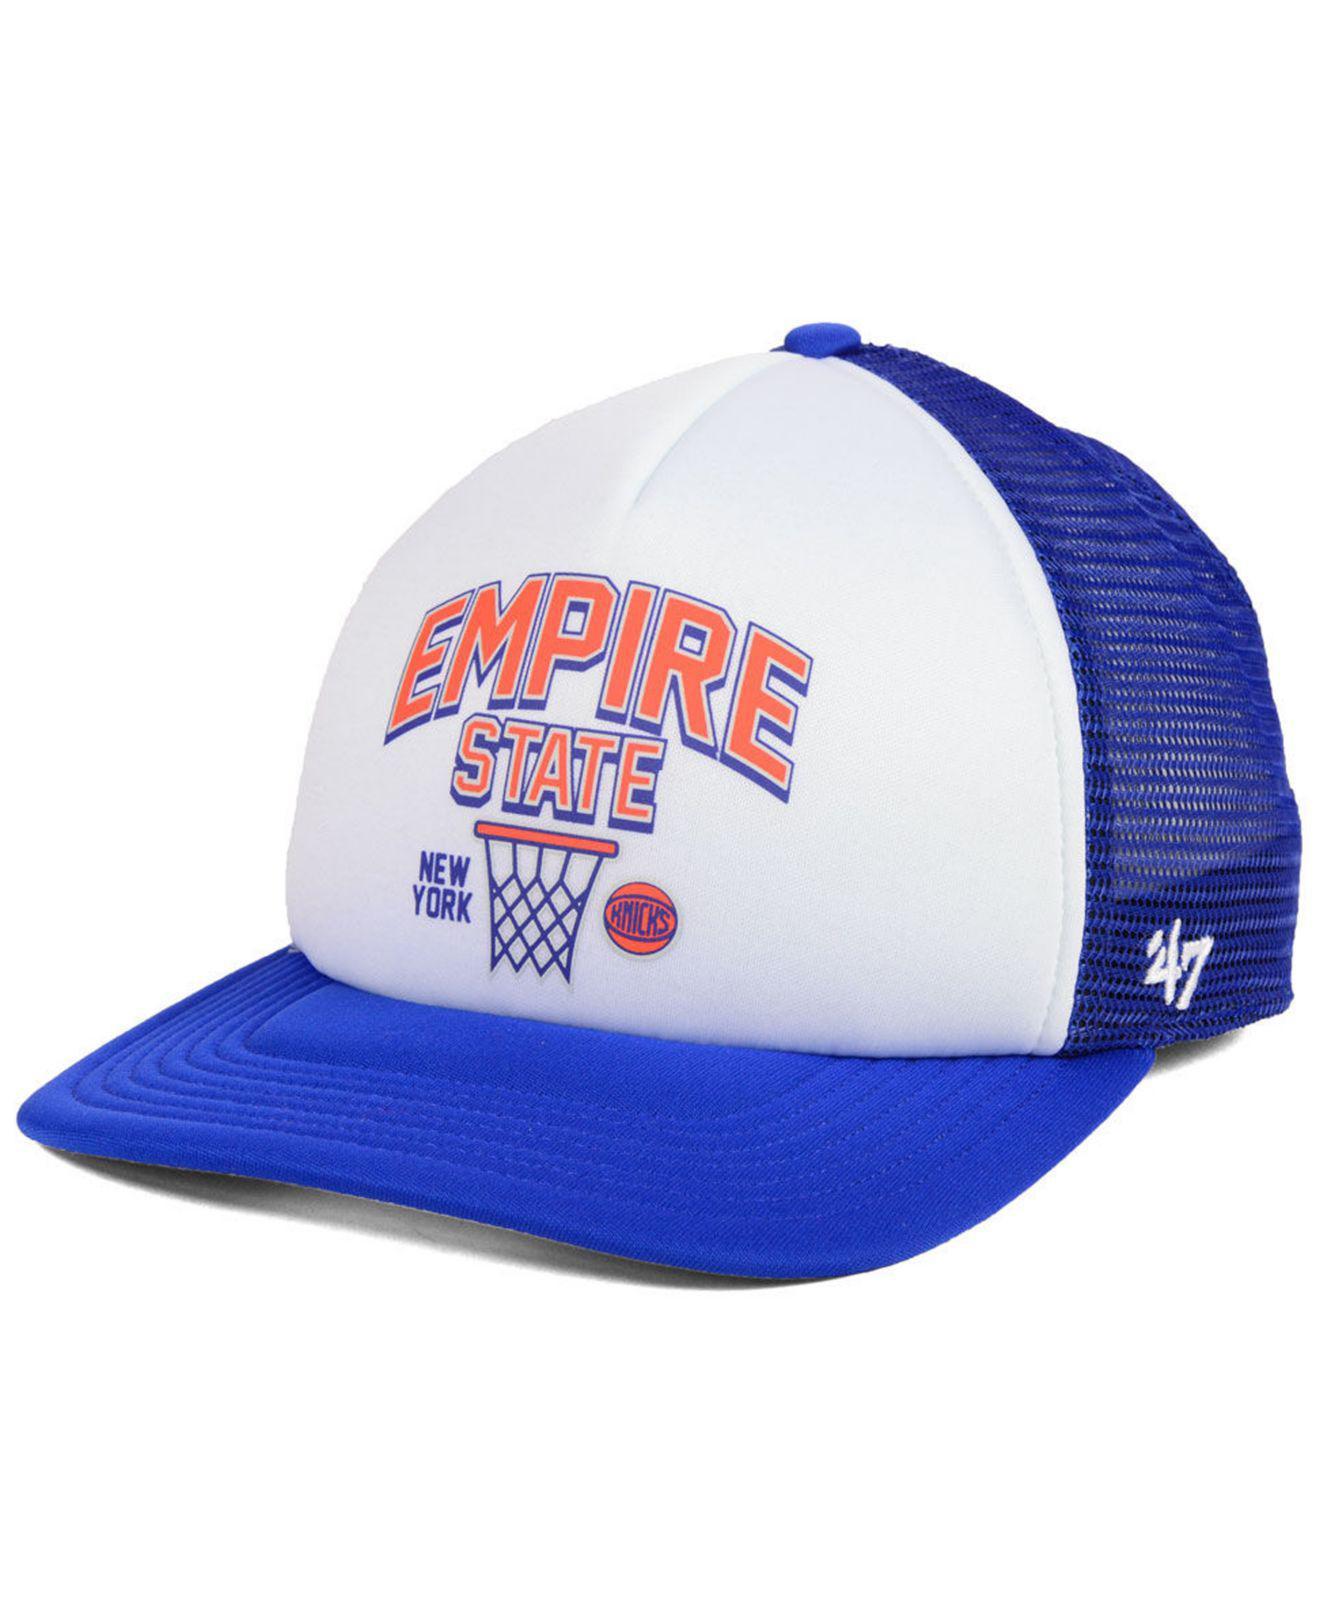 online store 3095a 60eed ... spain 47 brand. mens blue new york knicks region mesh mvp cap a44e7  224a4